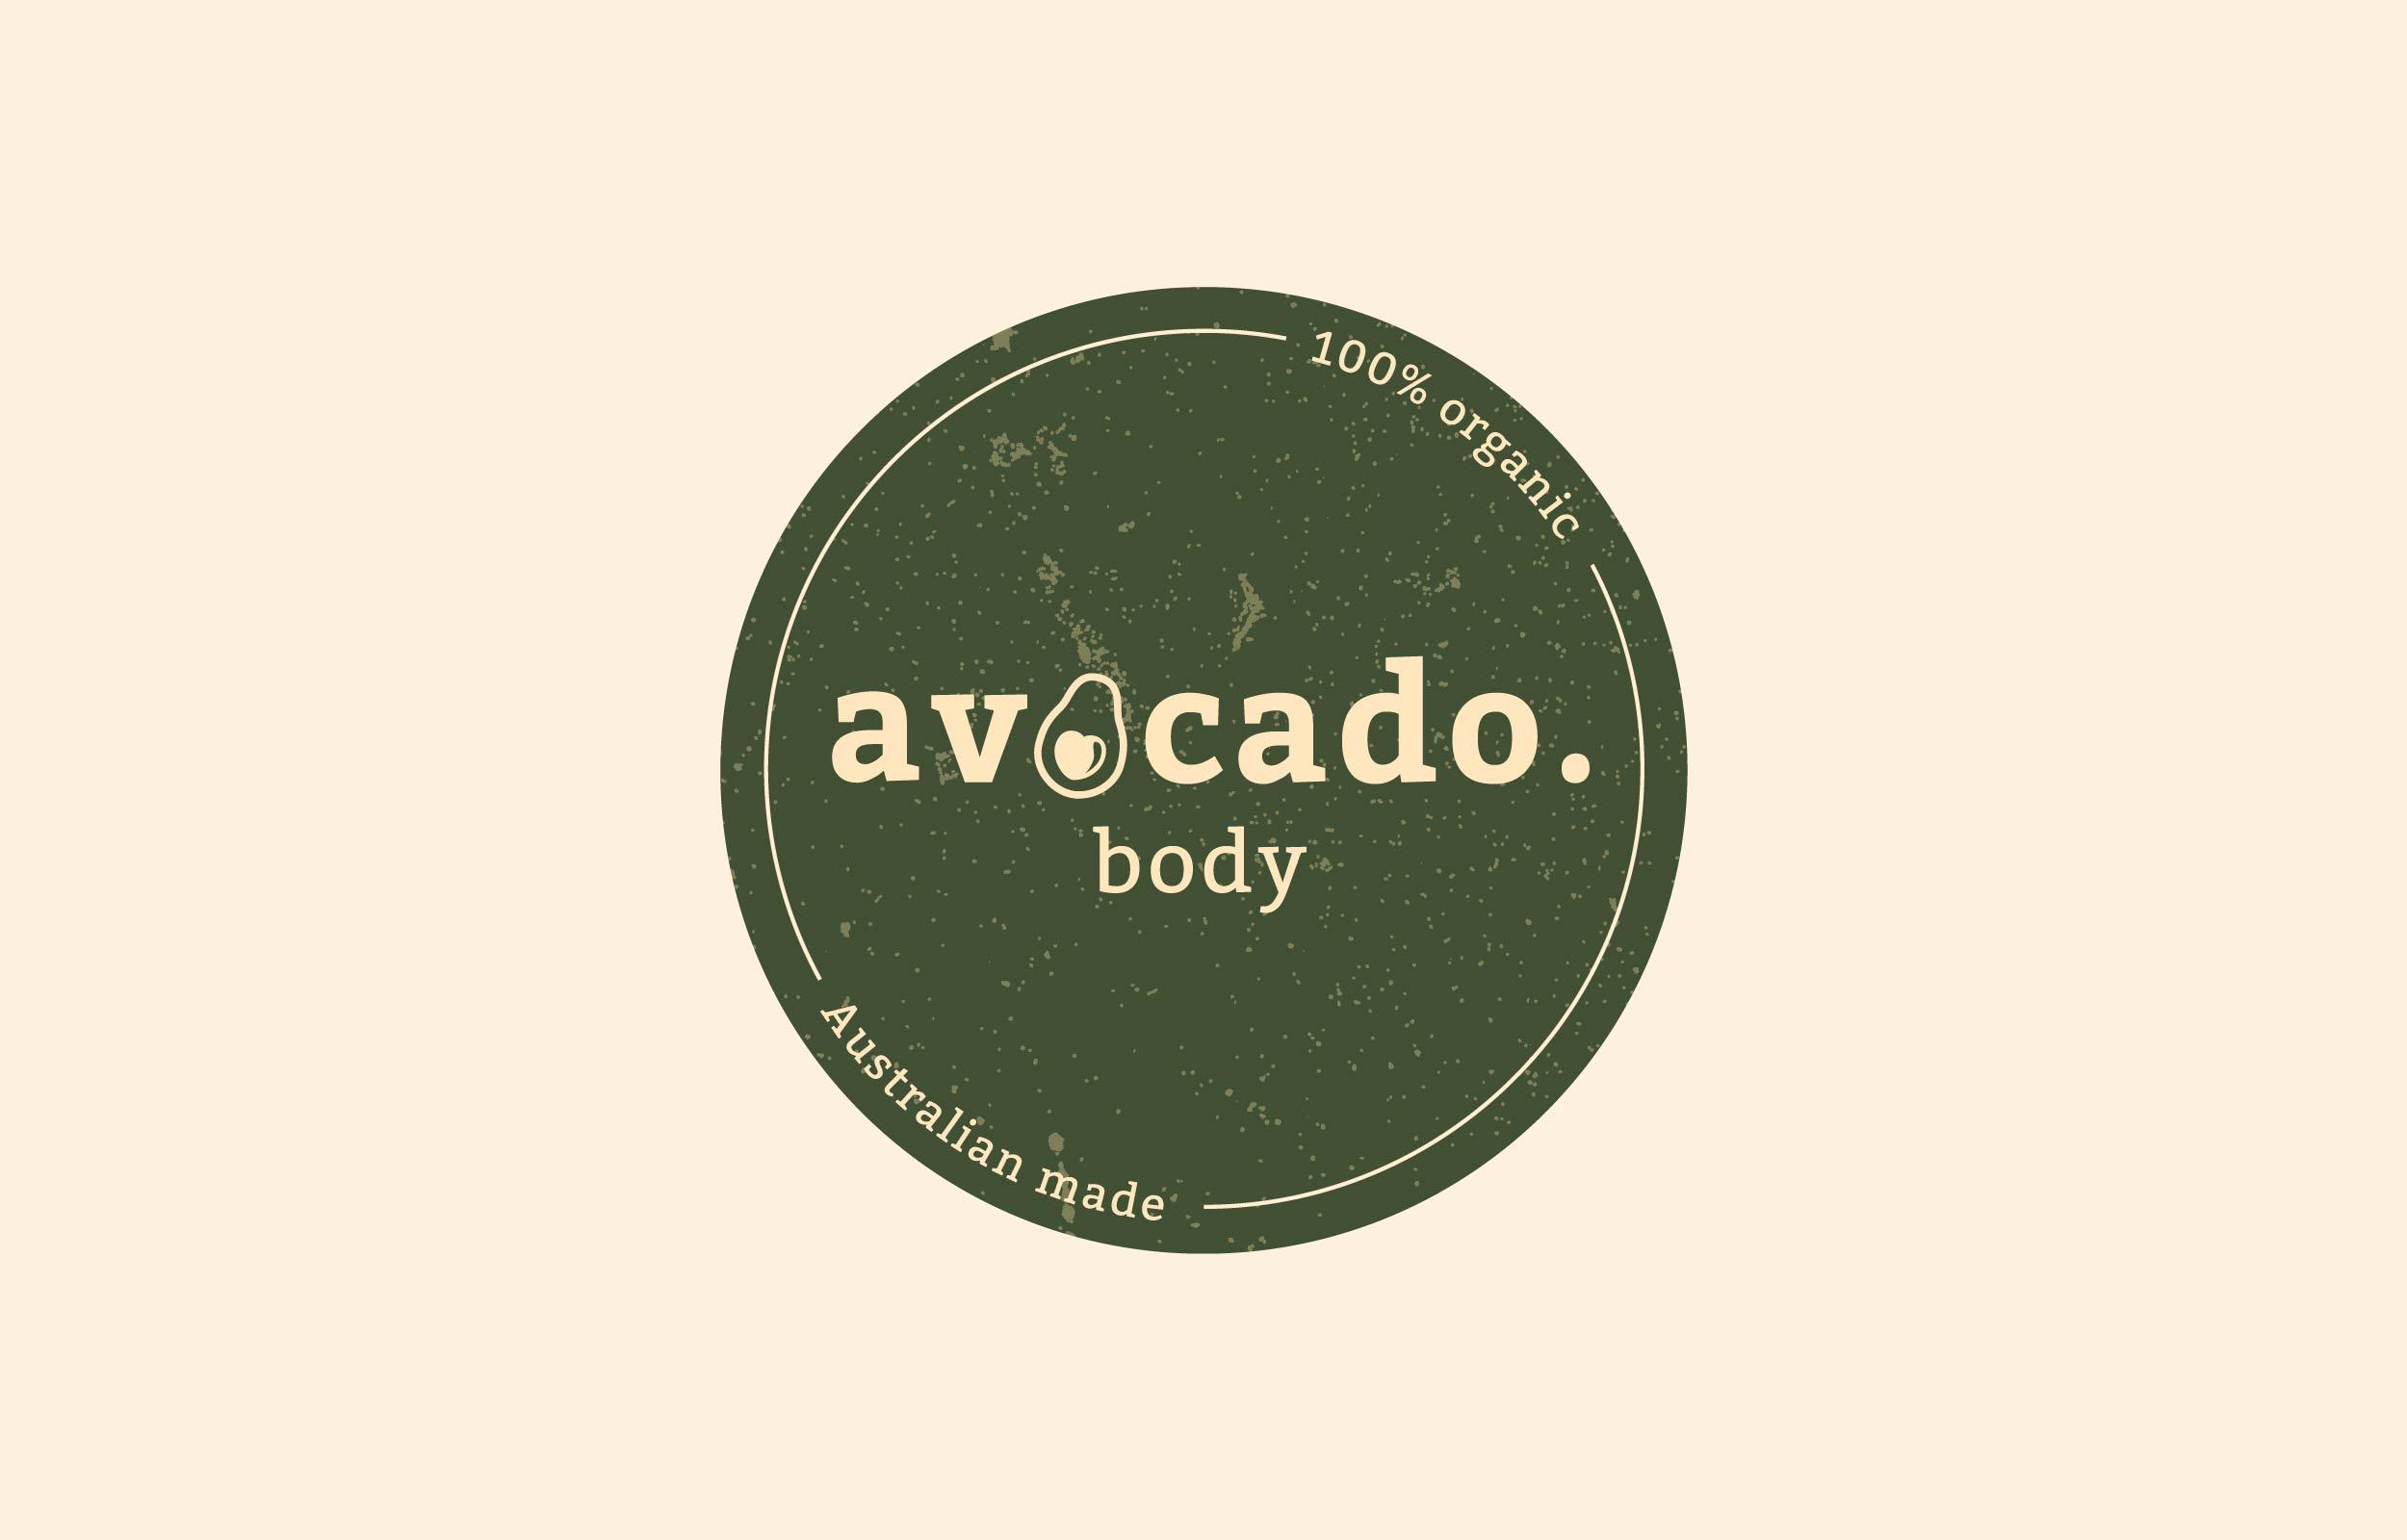 avocado-body-scrub-banner-3.jpg